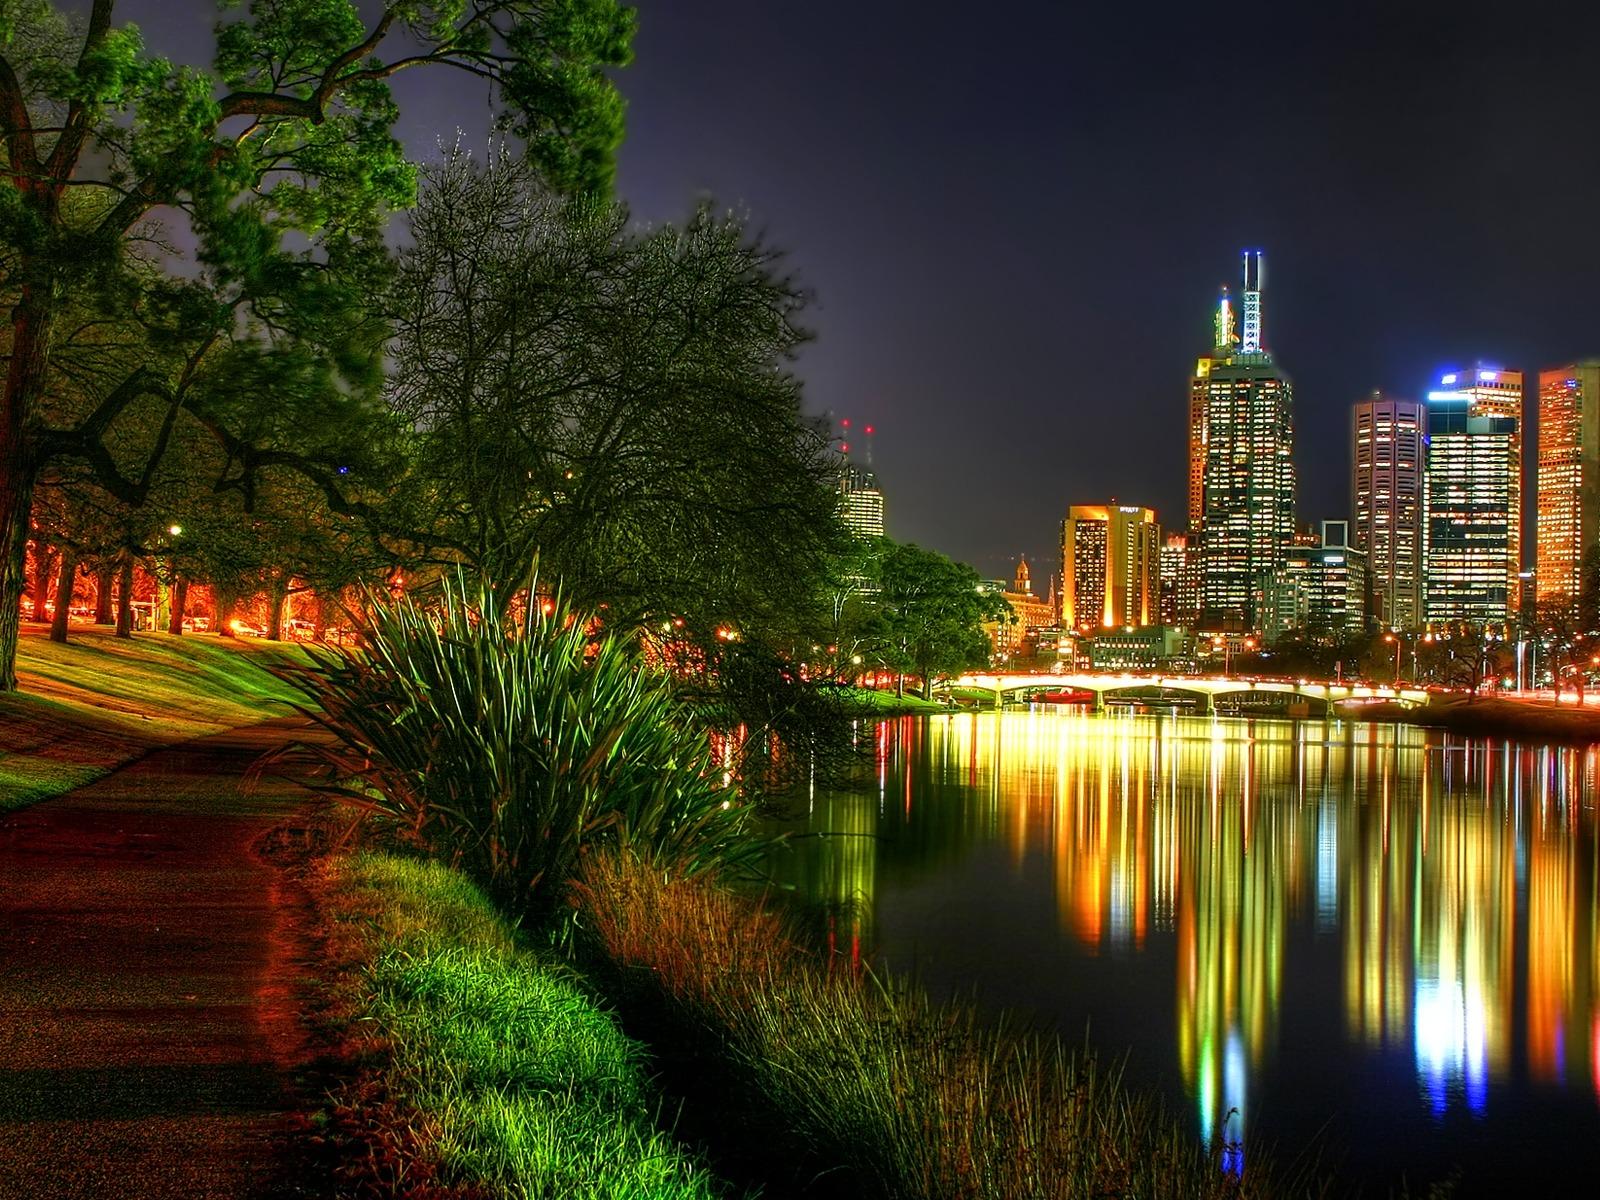 The city night lights wallpapers The city night lights stock photos 1600x1200